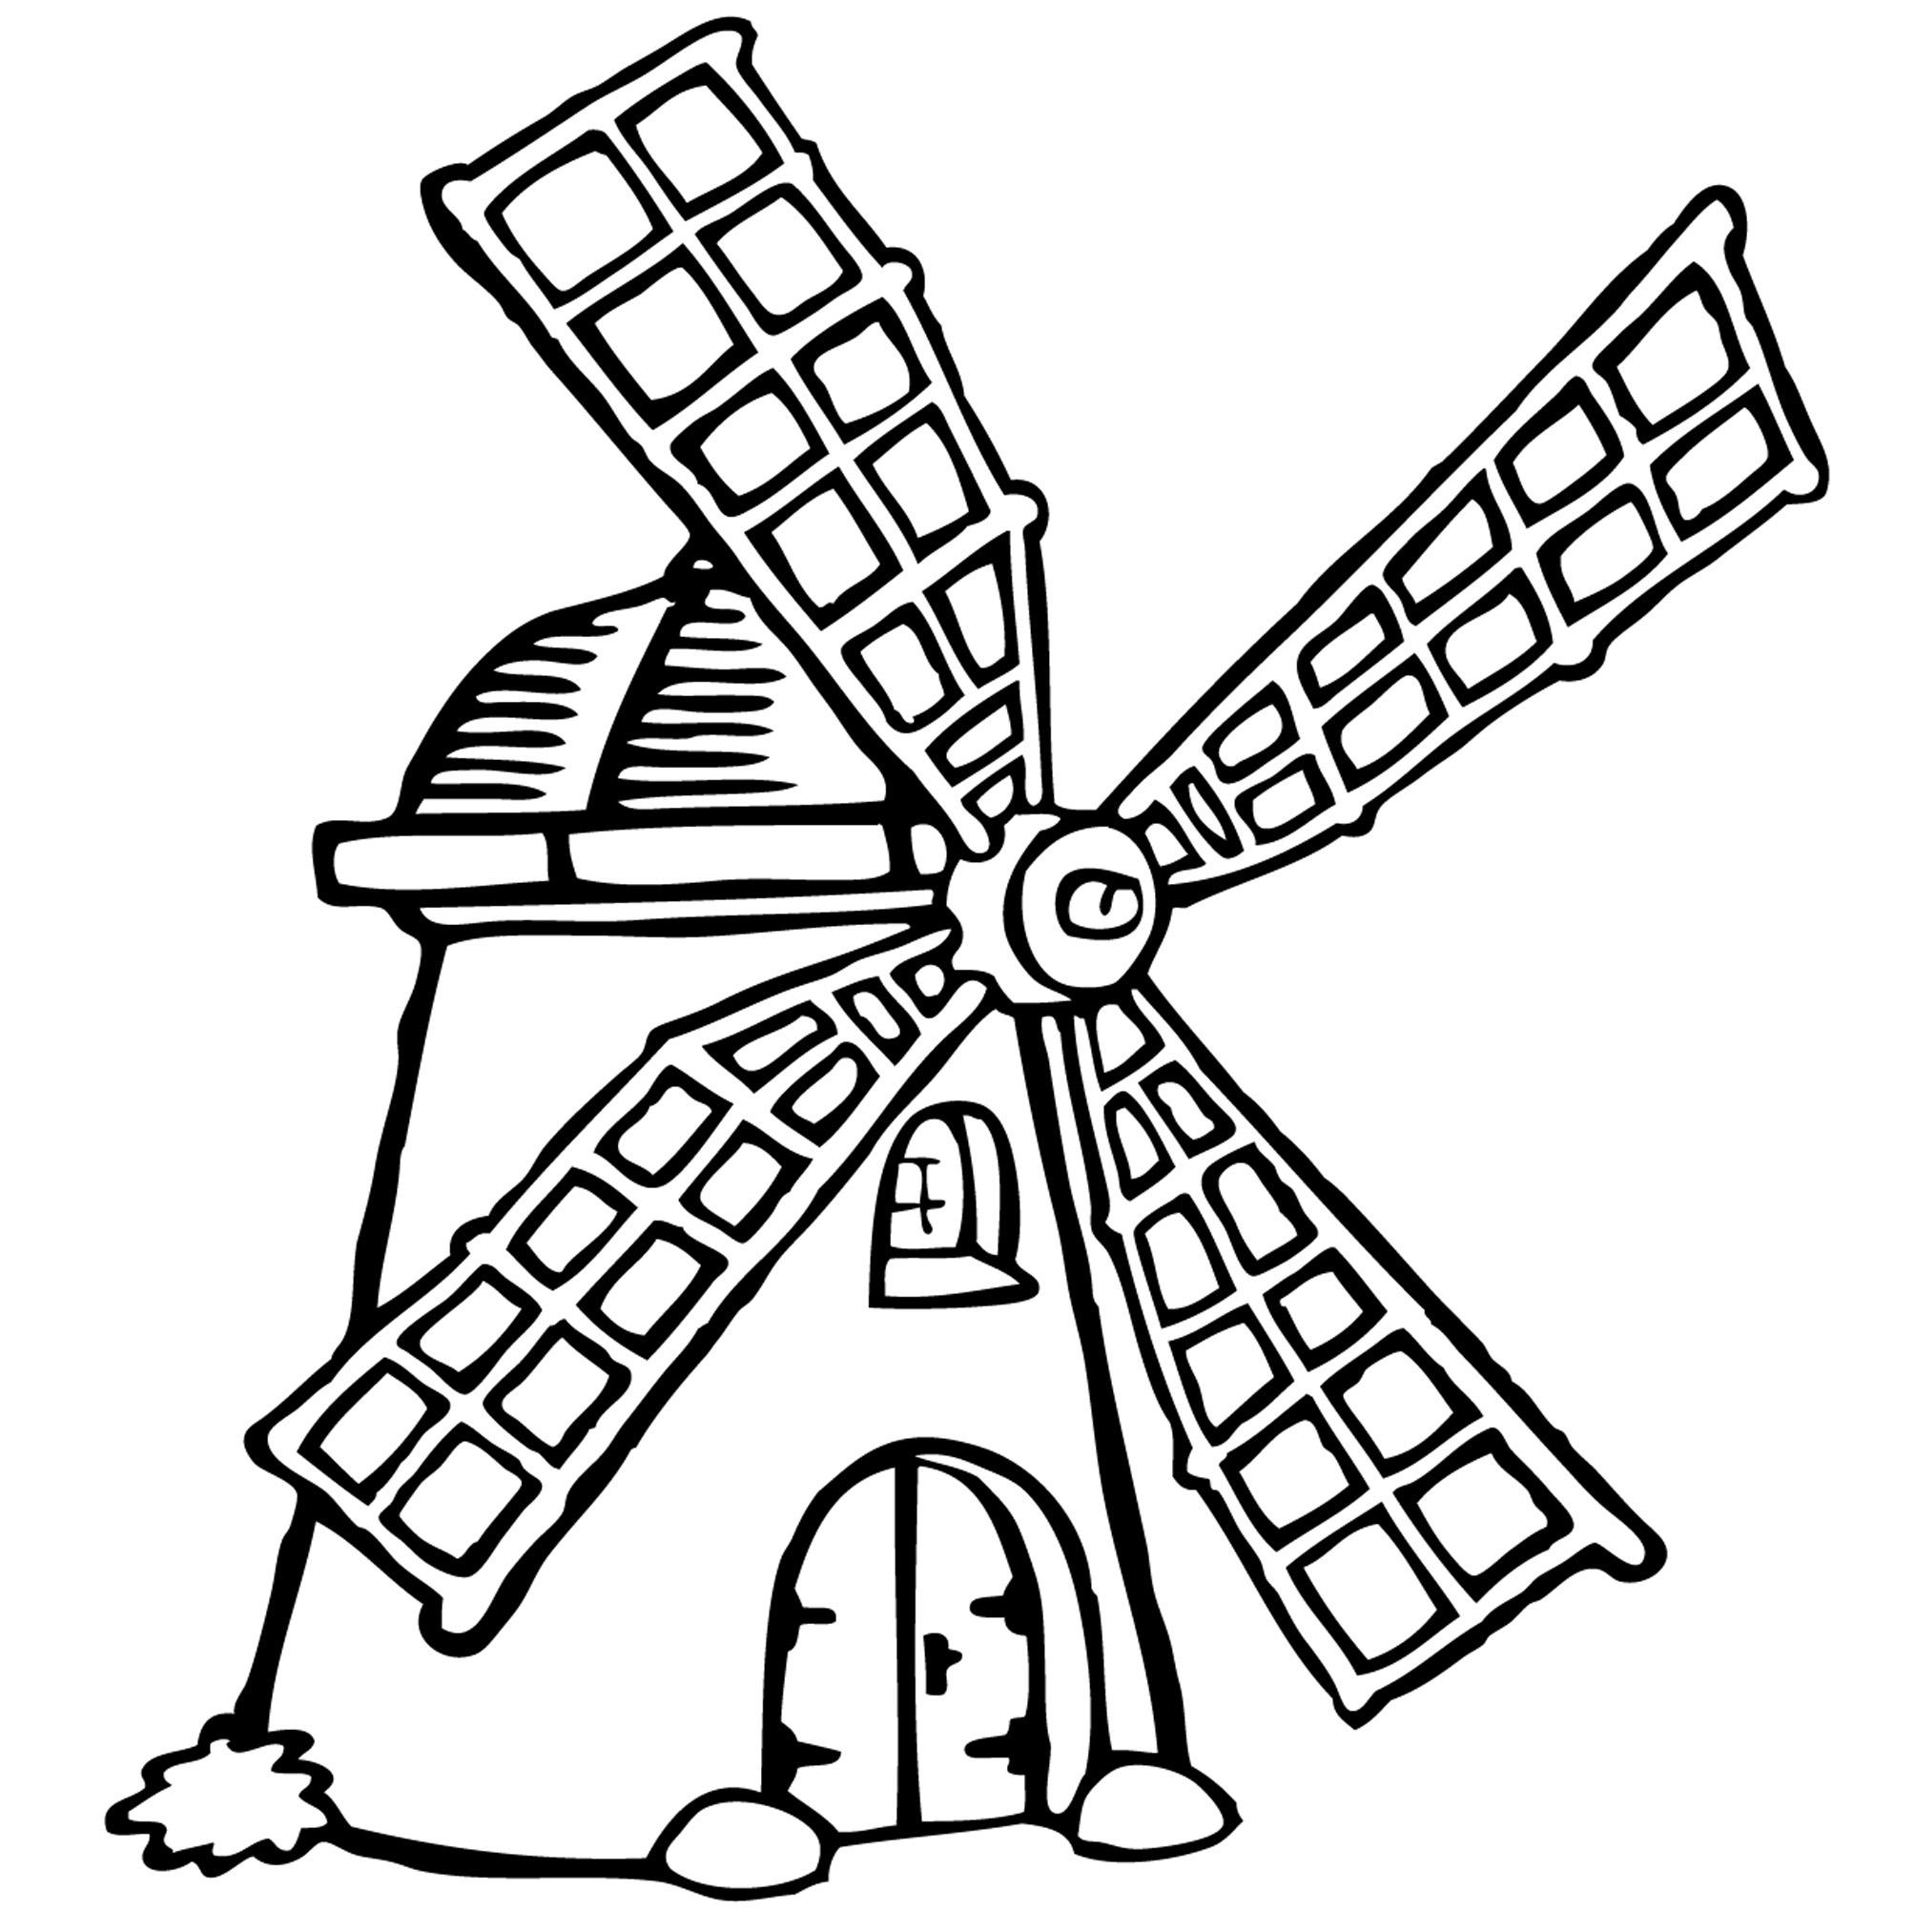 2008x2026 Minieolico, Eolico, Mini Eolico, Wind Turbines, Marco Partesotti